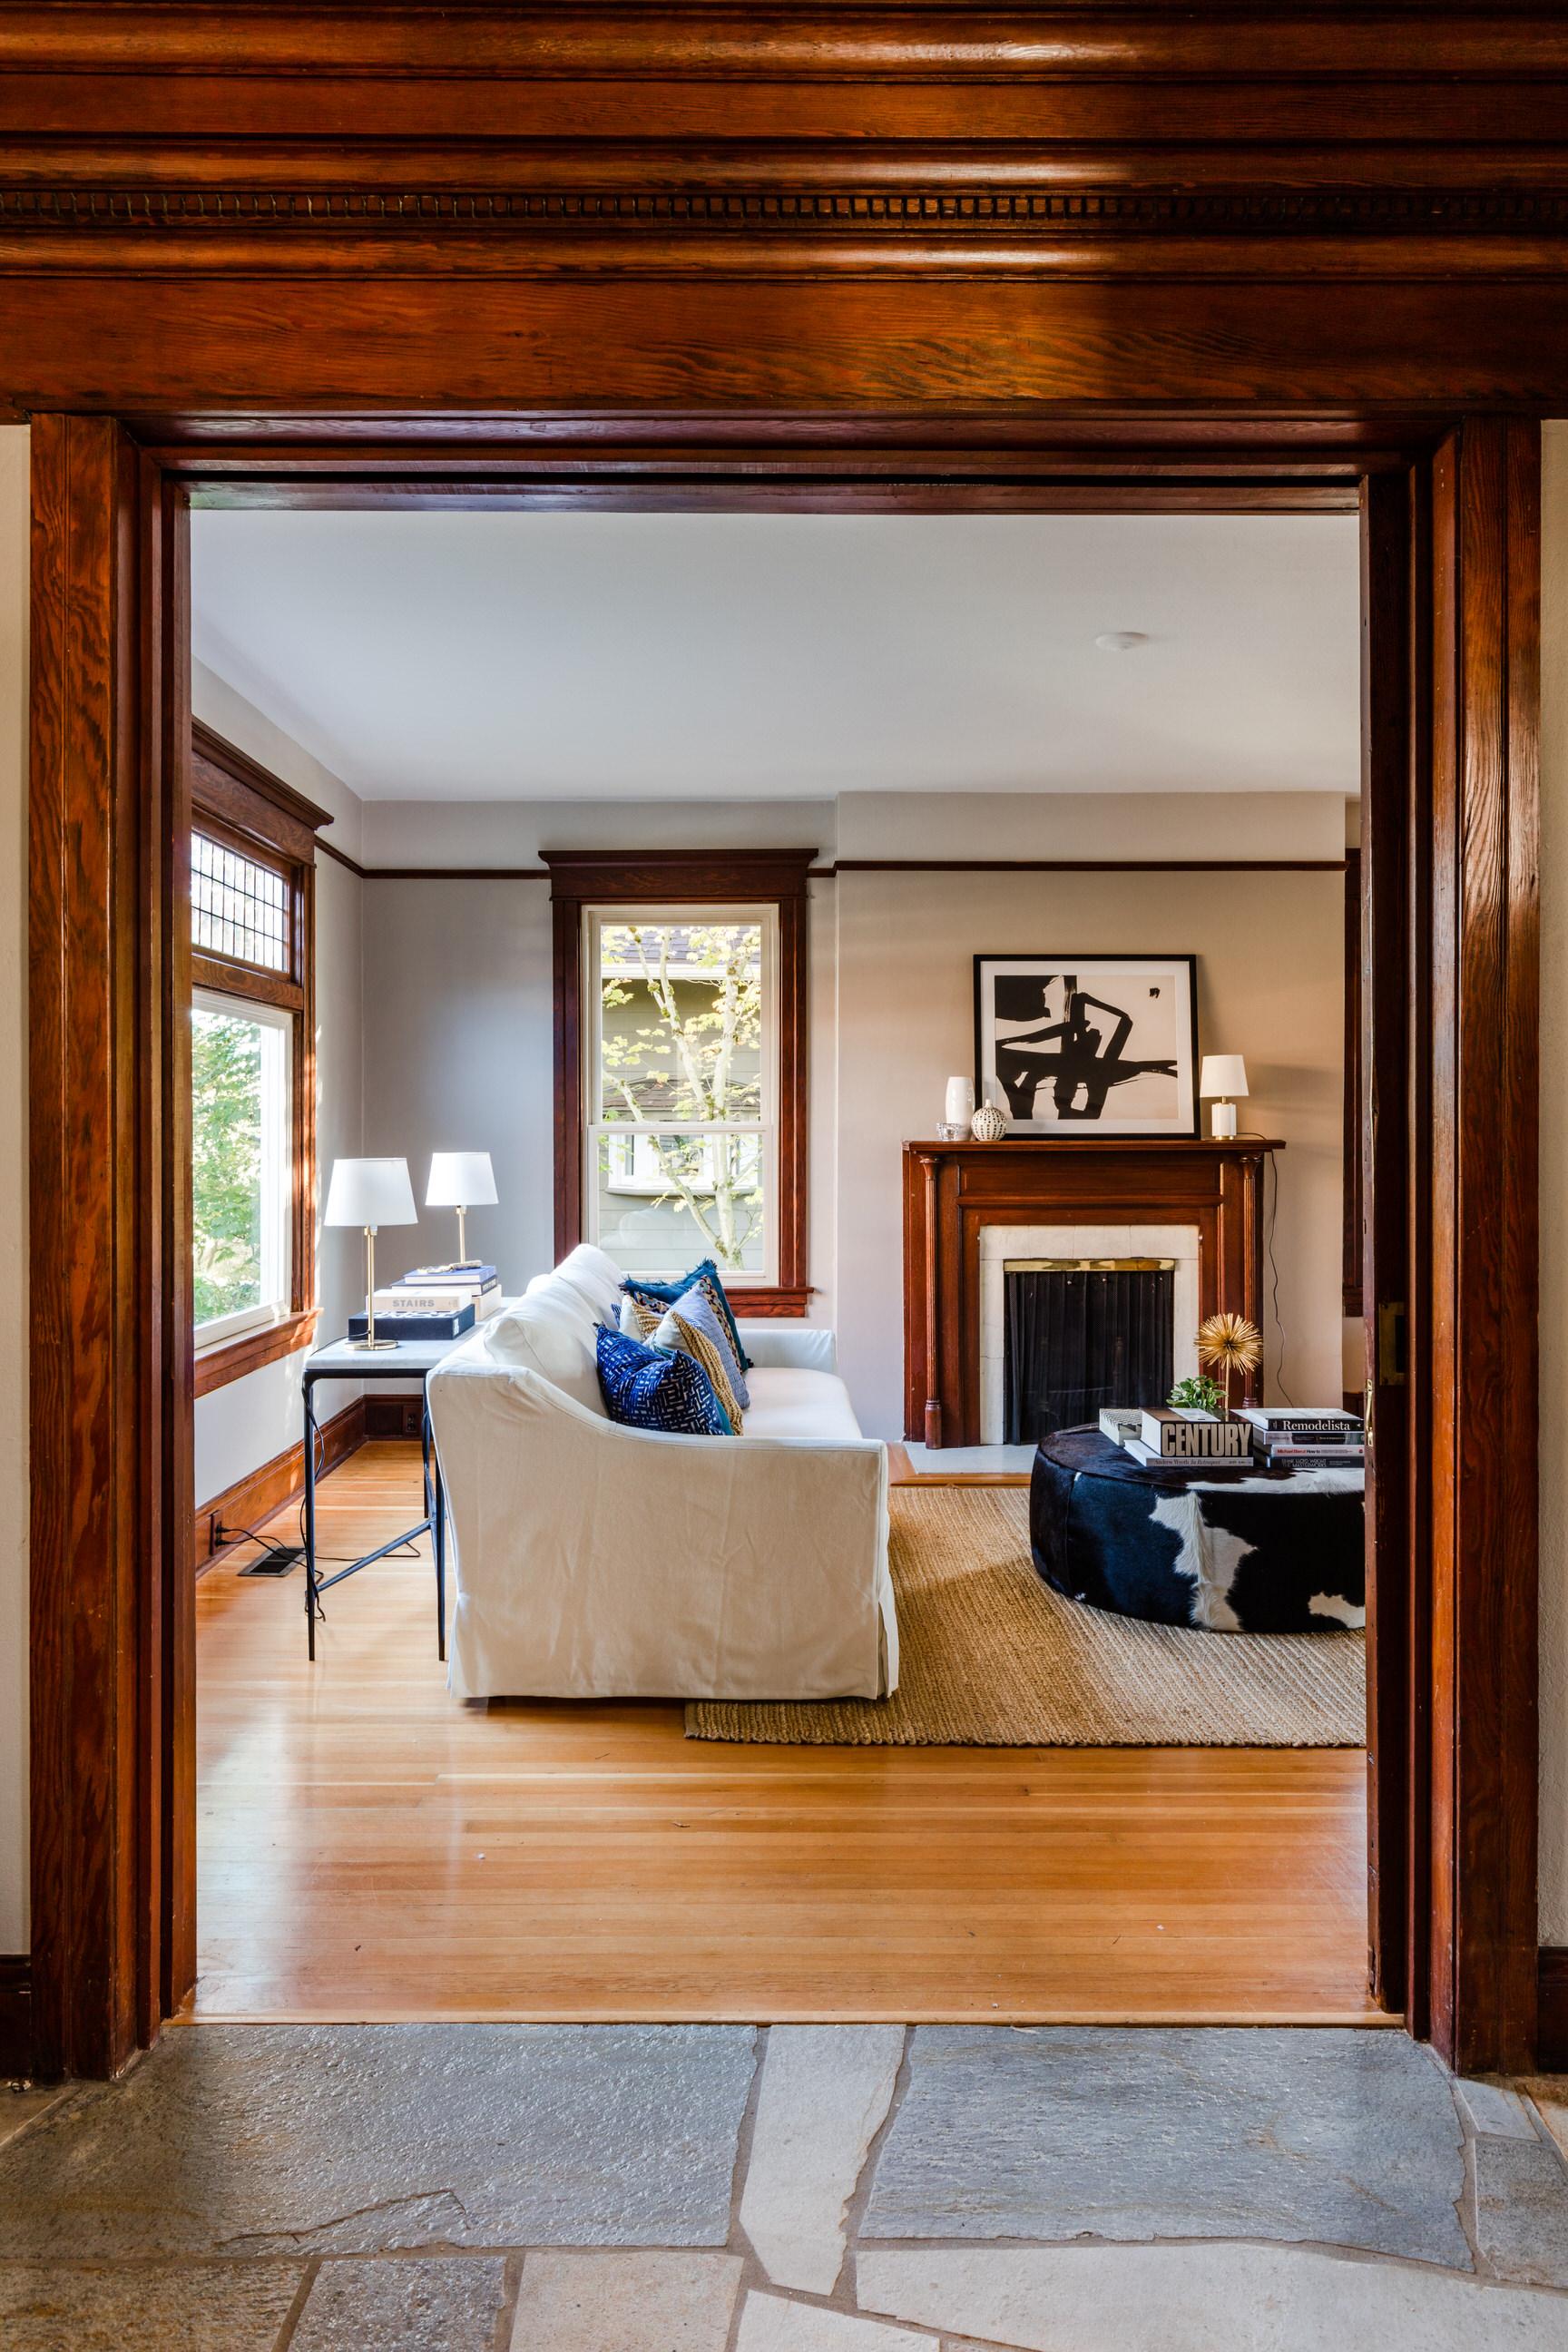 0018-Miranda-Estes-Architectural-Photography-Anne-W-Nelson-33rd Ave-20181011.jpg